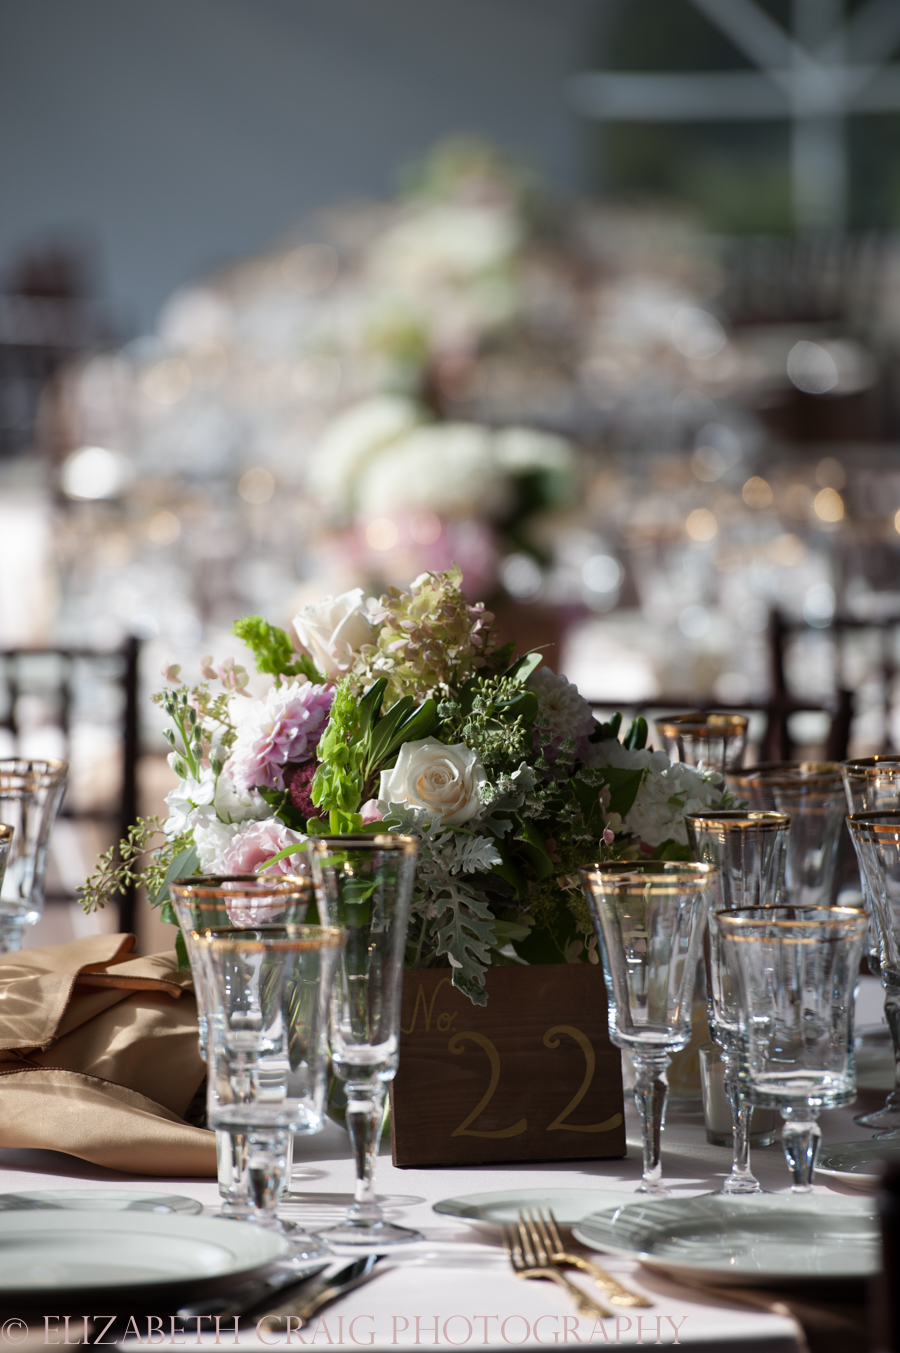 Dubois Brockway St. Marys PA Weddings-0156